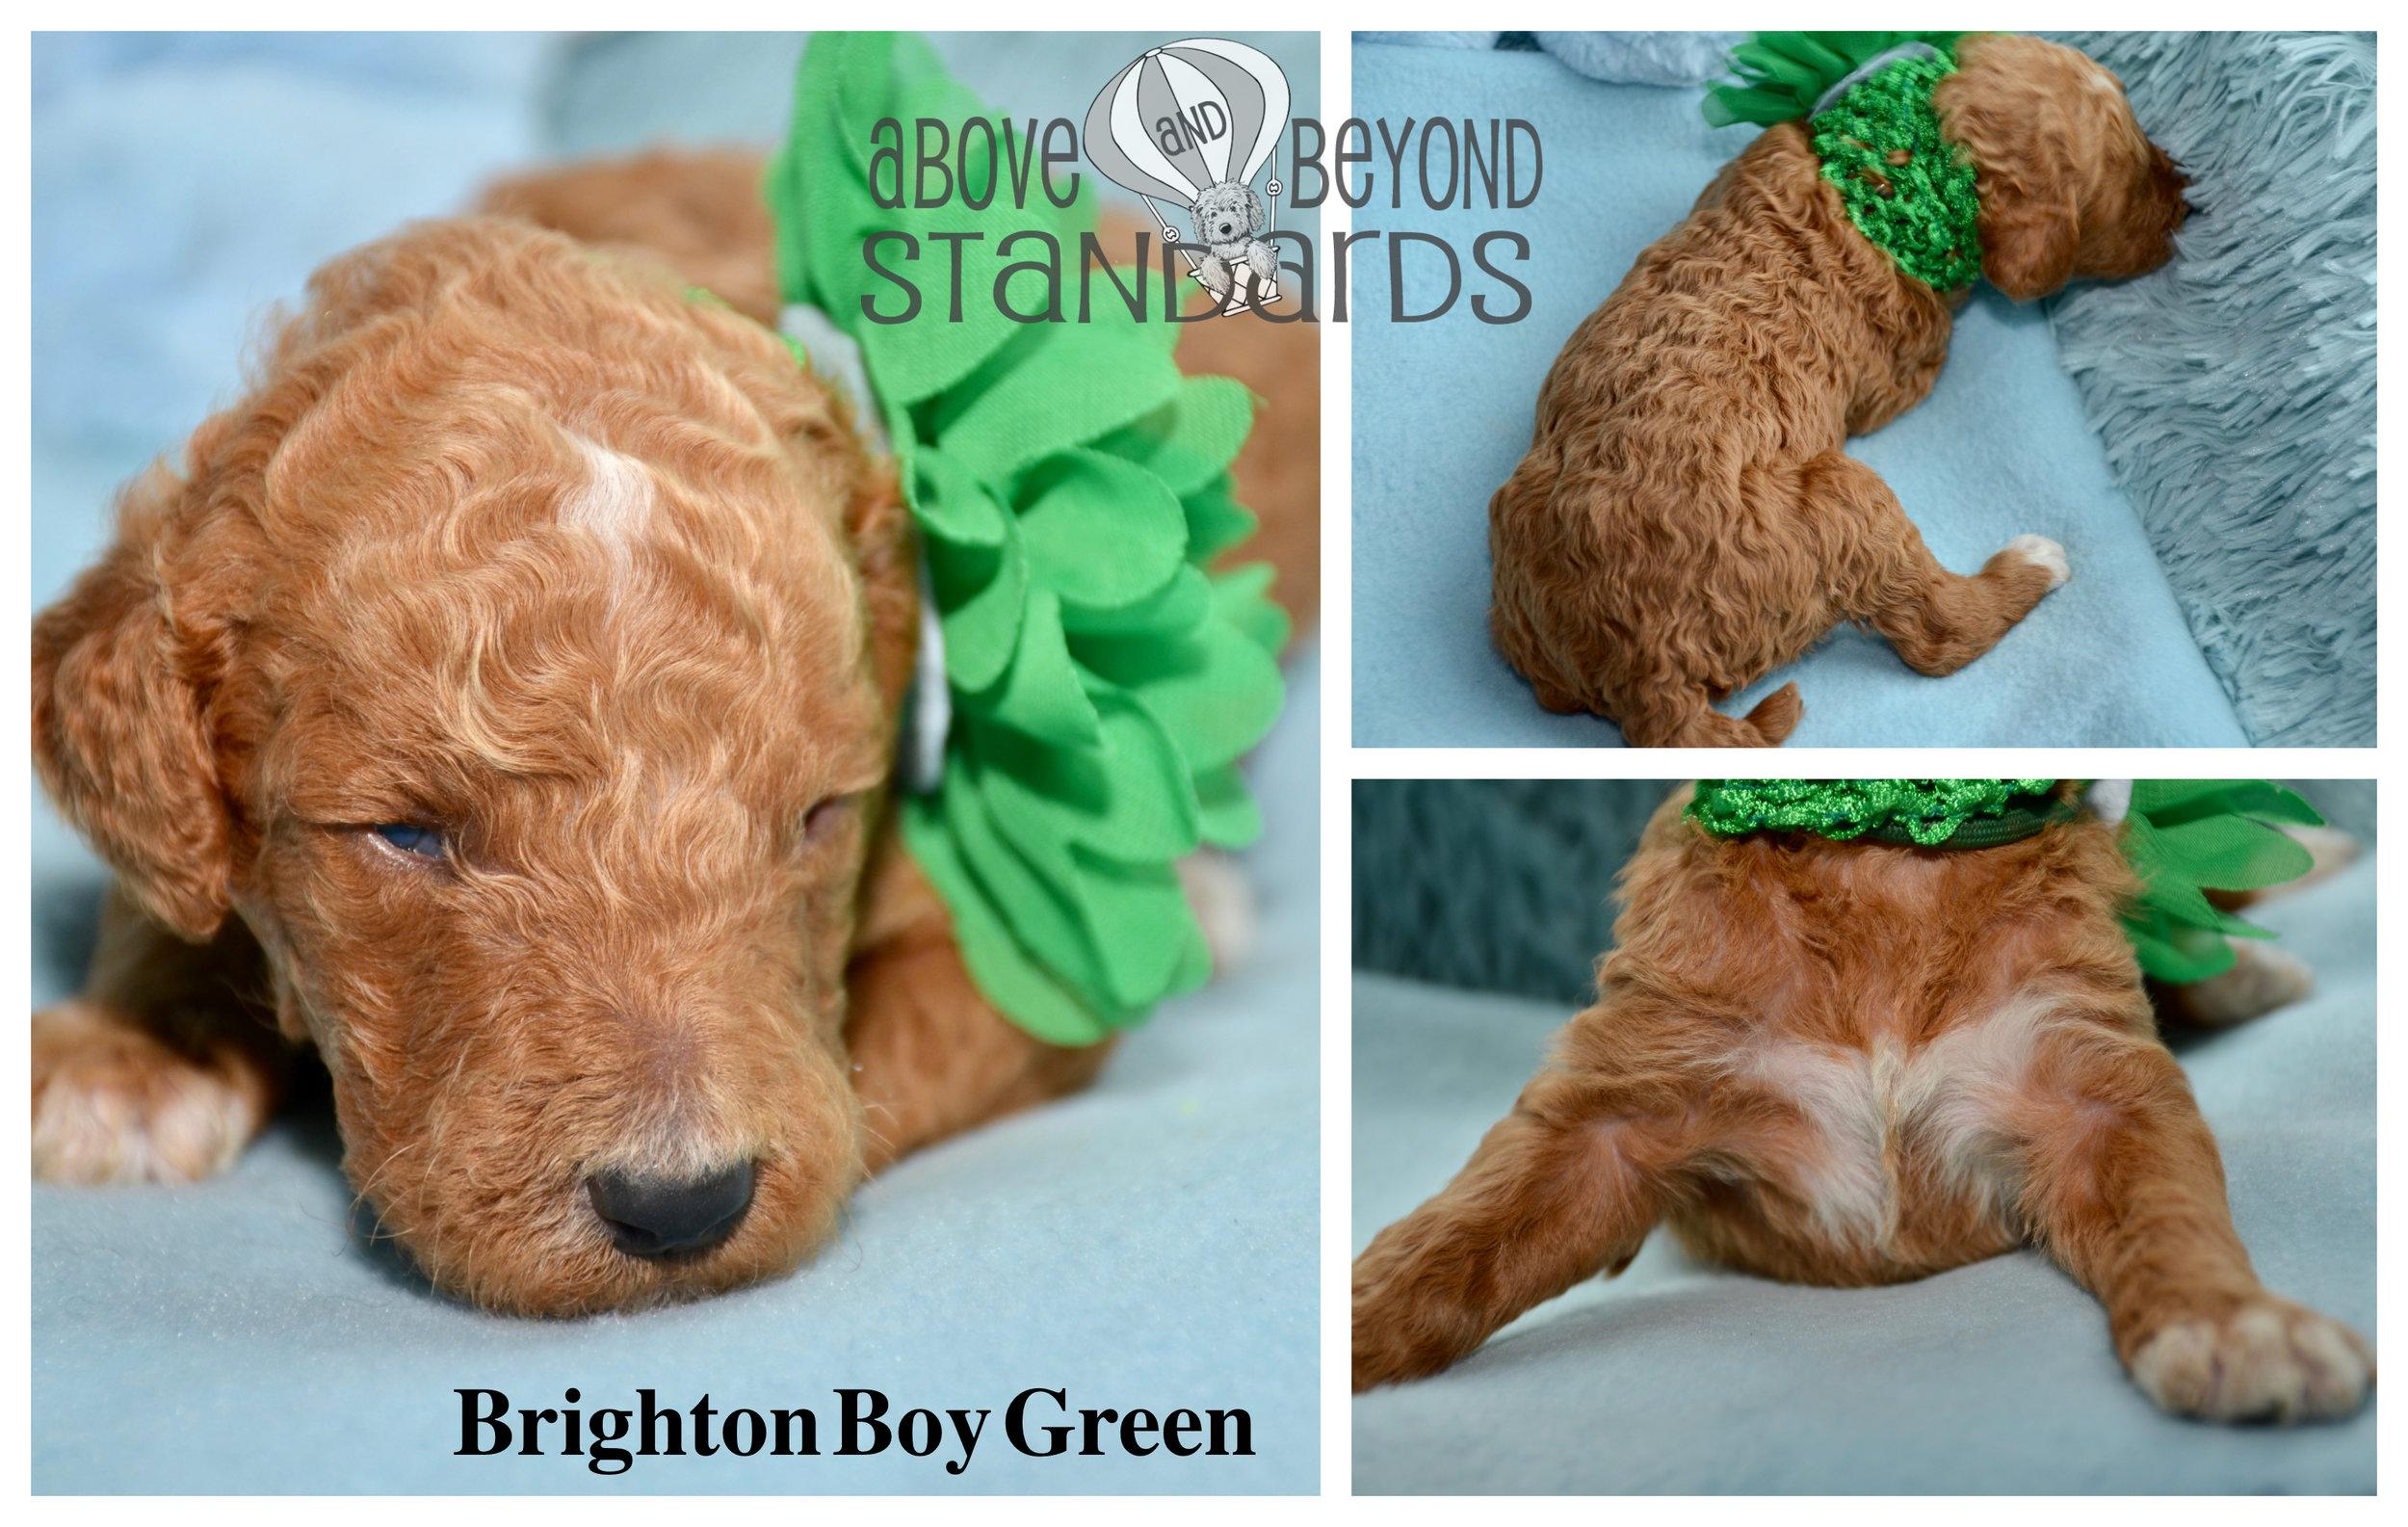 Brighton Boy Green - EMILIE & CRUSHER STANDARD POODLE FEBRUARY 2ND, 2019.jpg